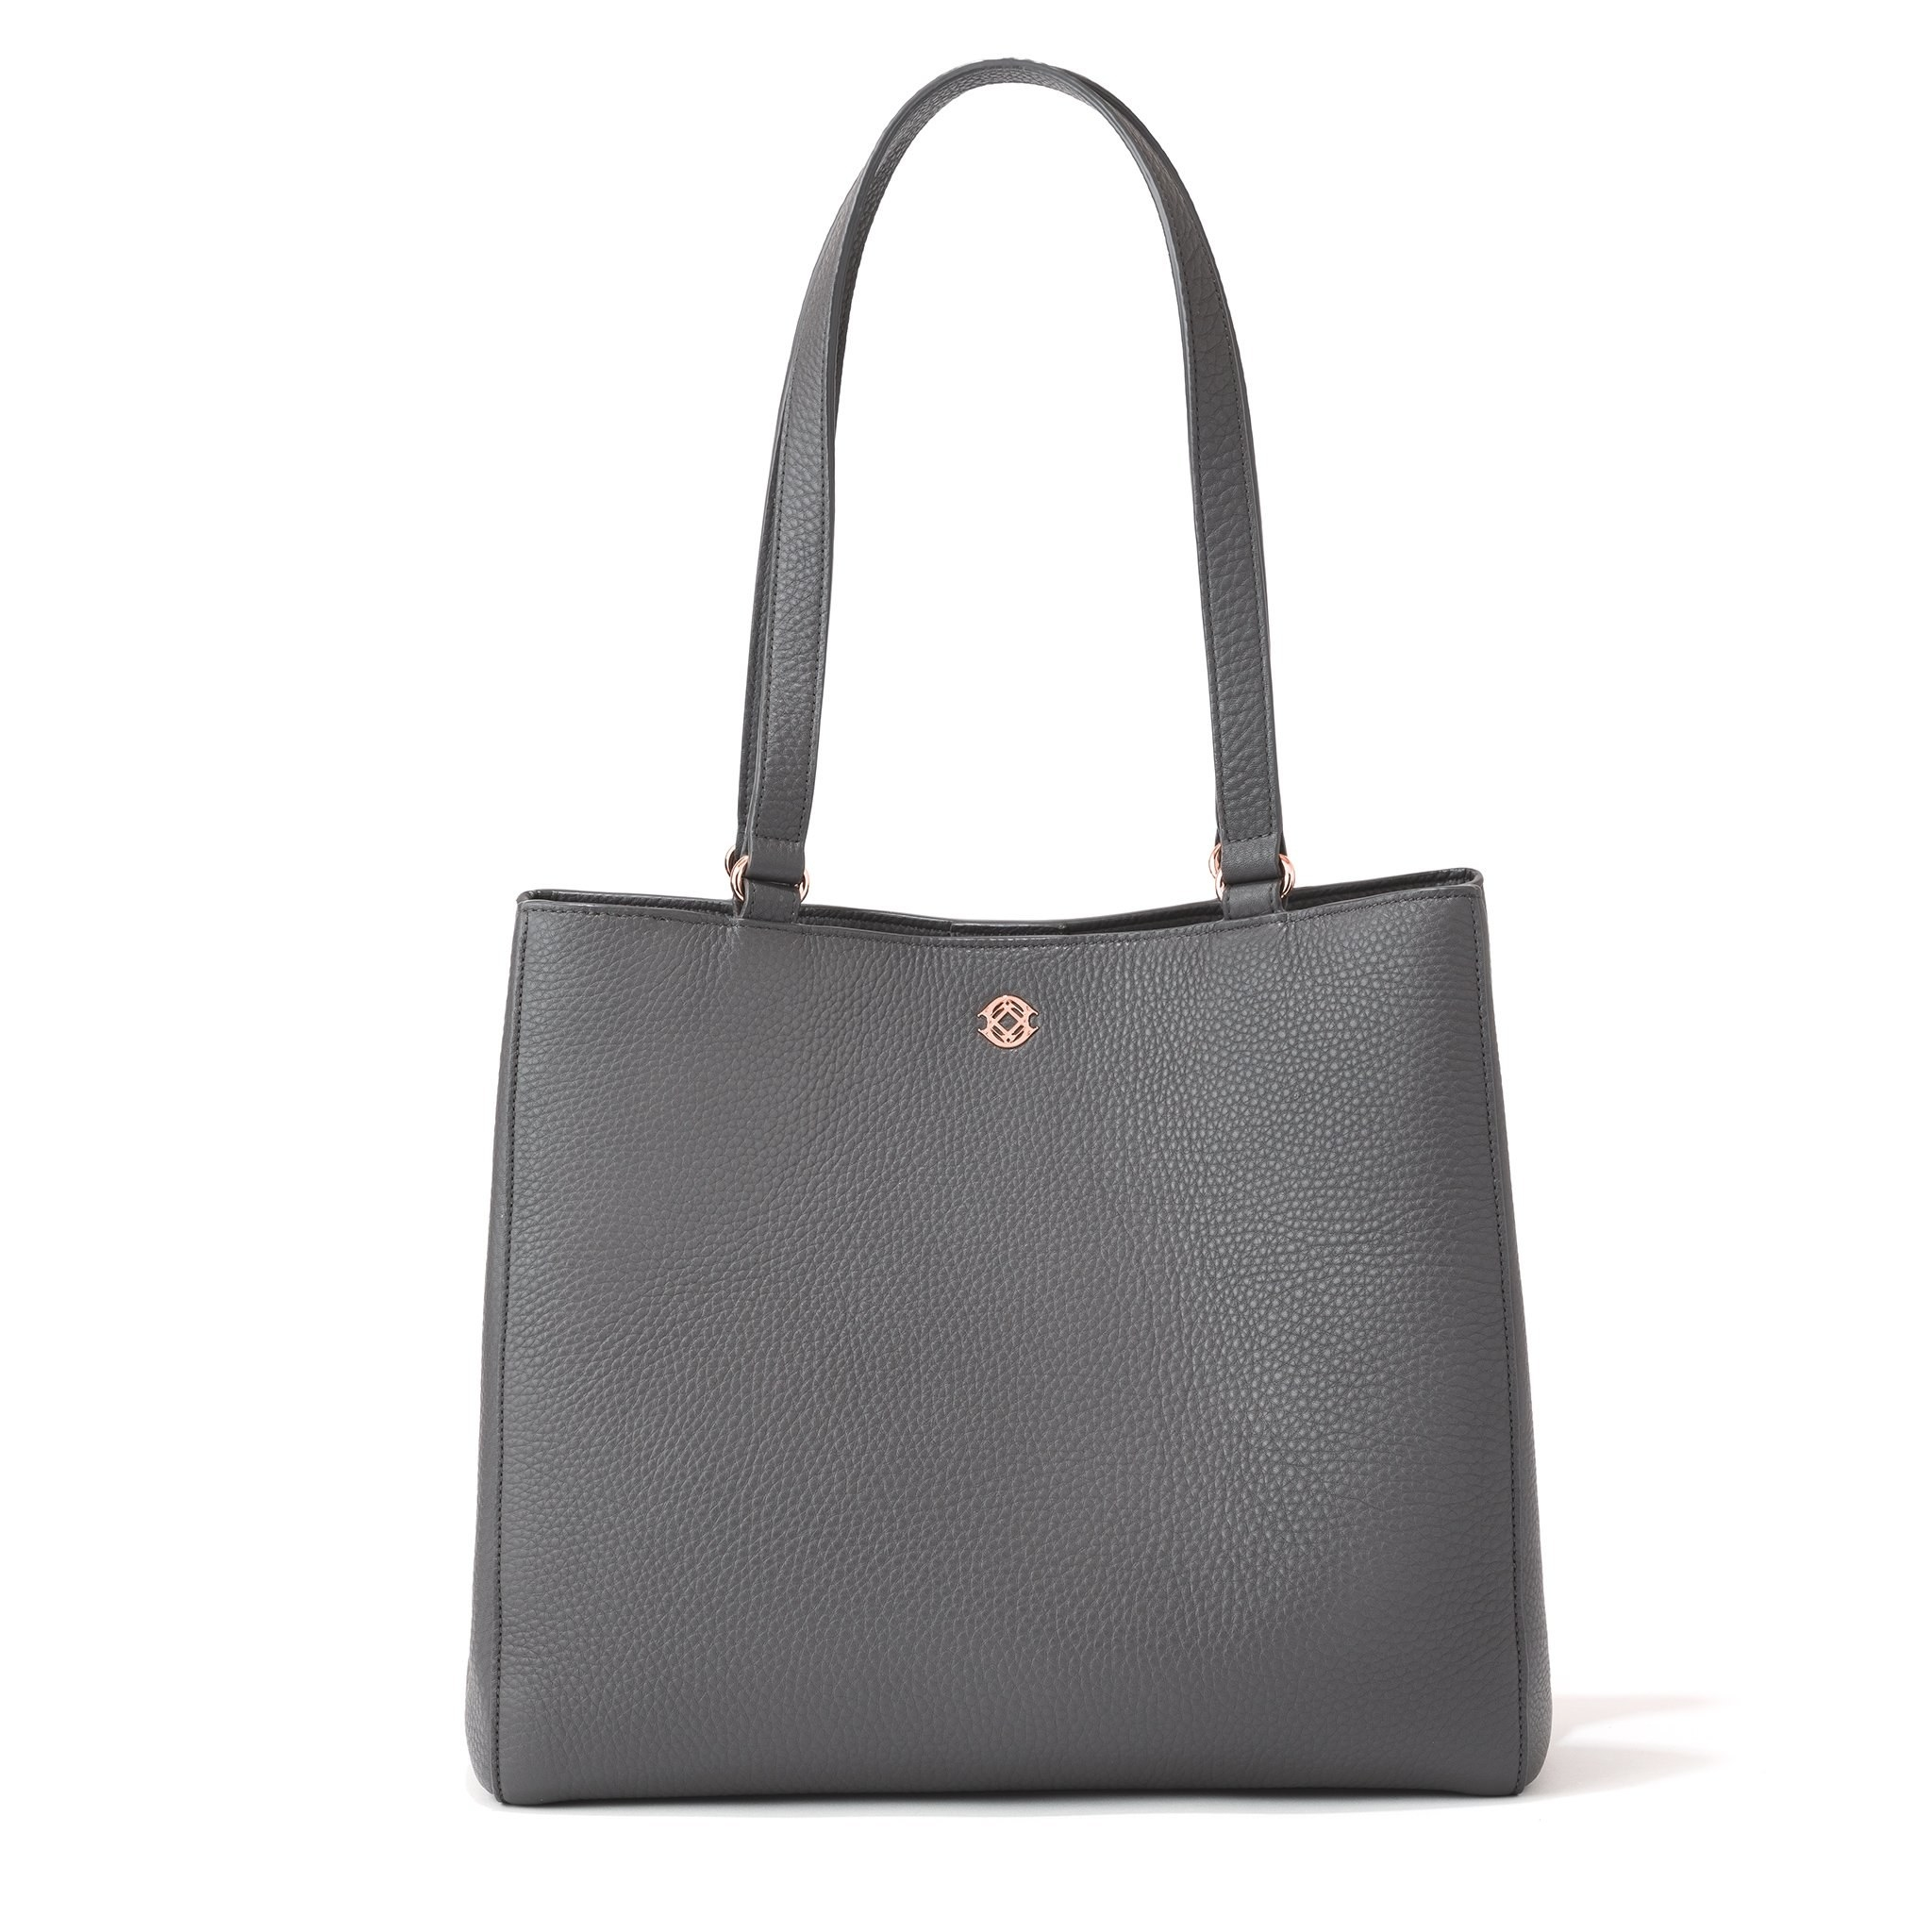 the gray tote bag